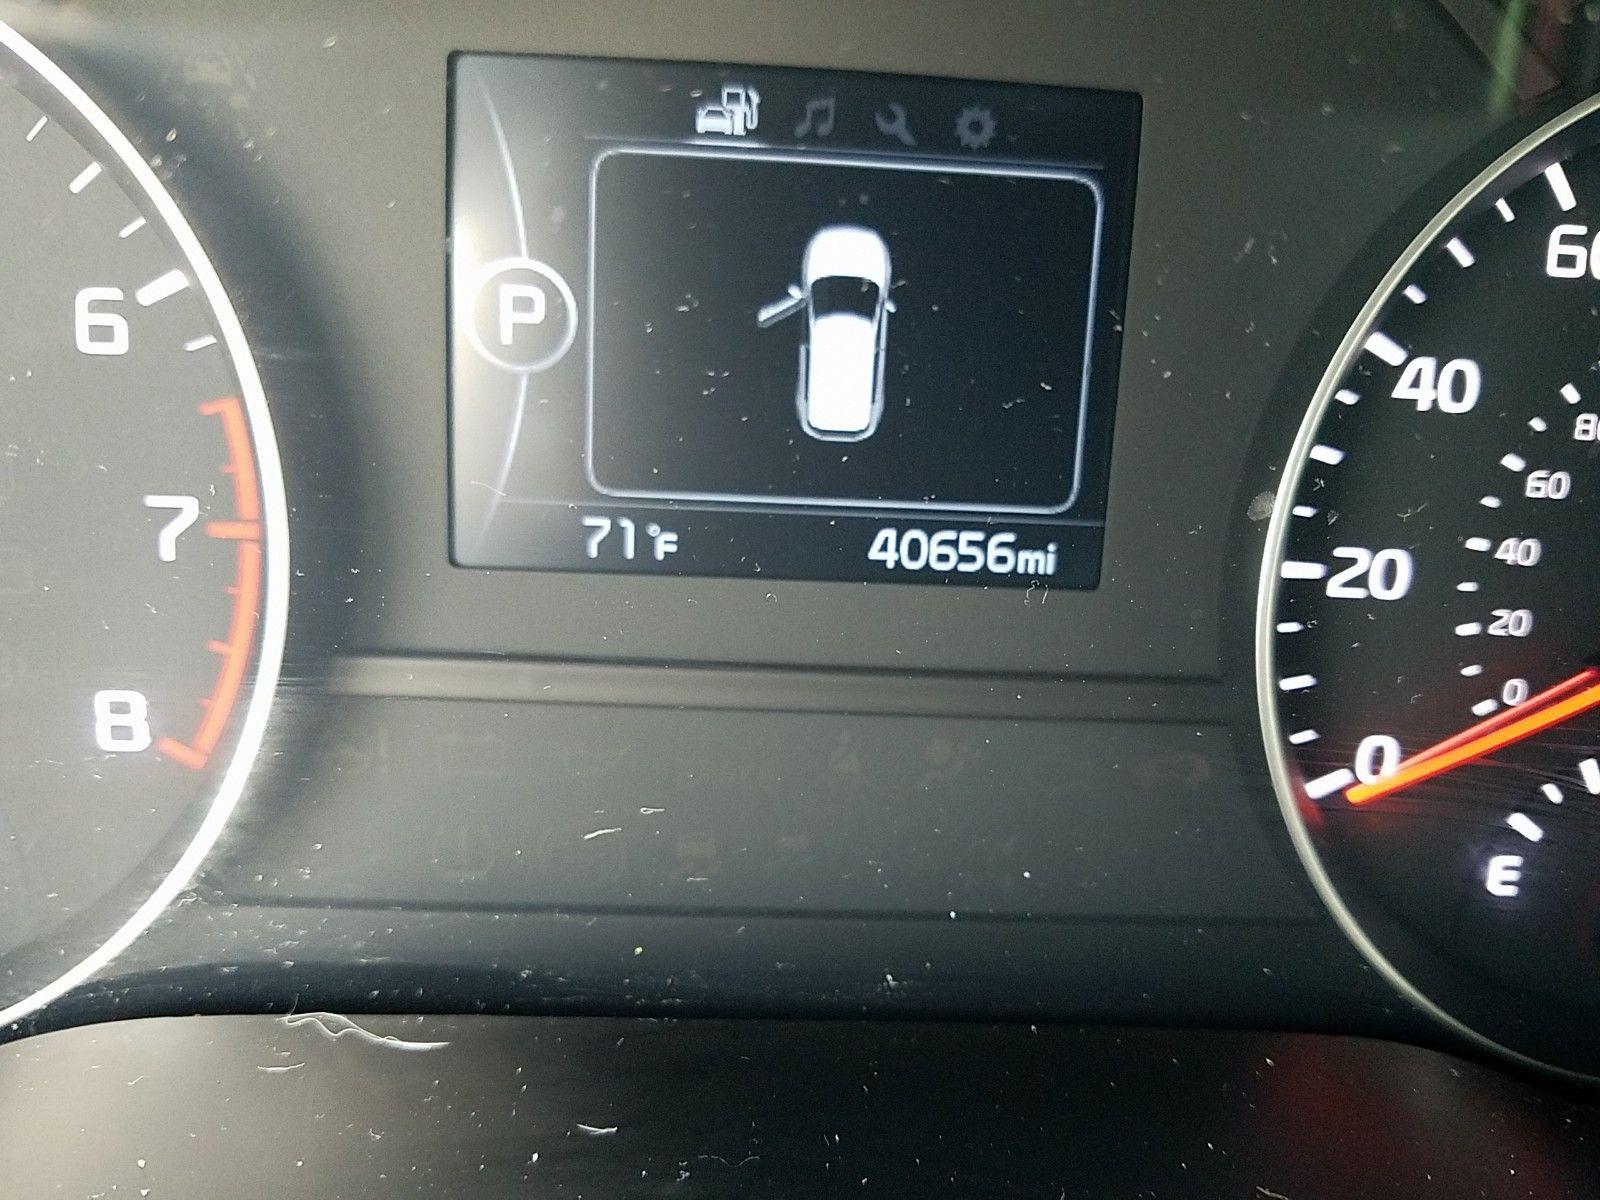 2019 KIA SPORTAGE FWD 4C EX - 12